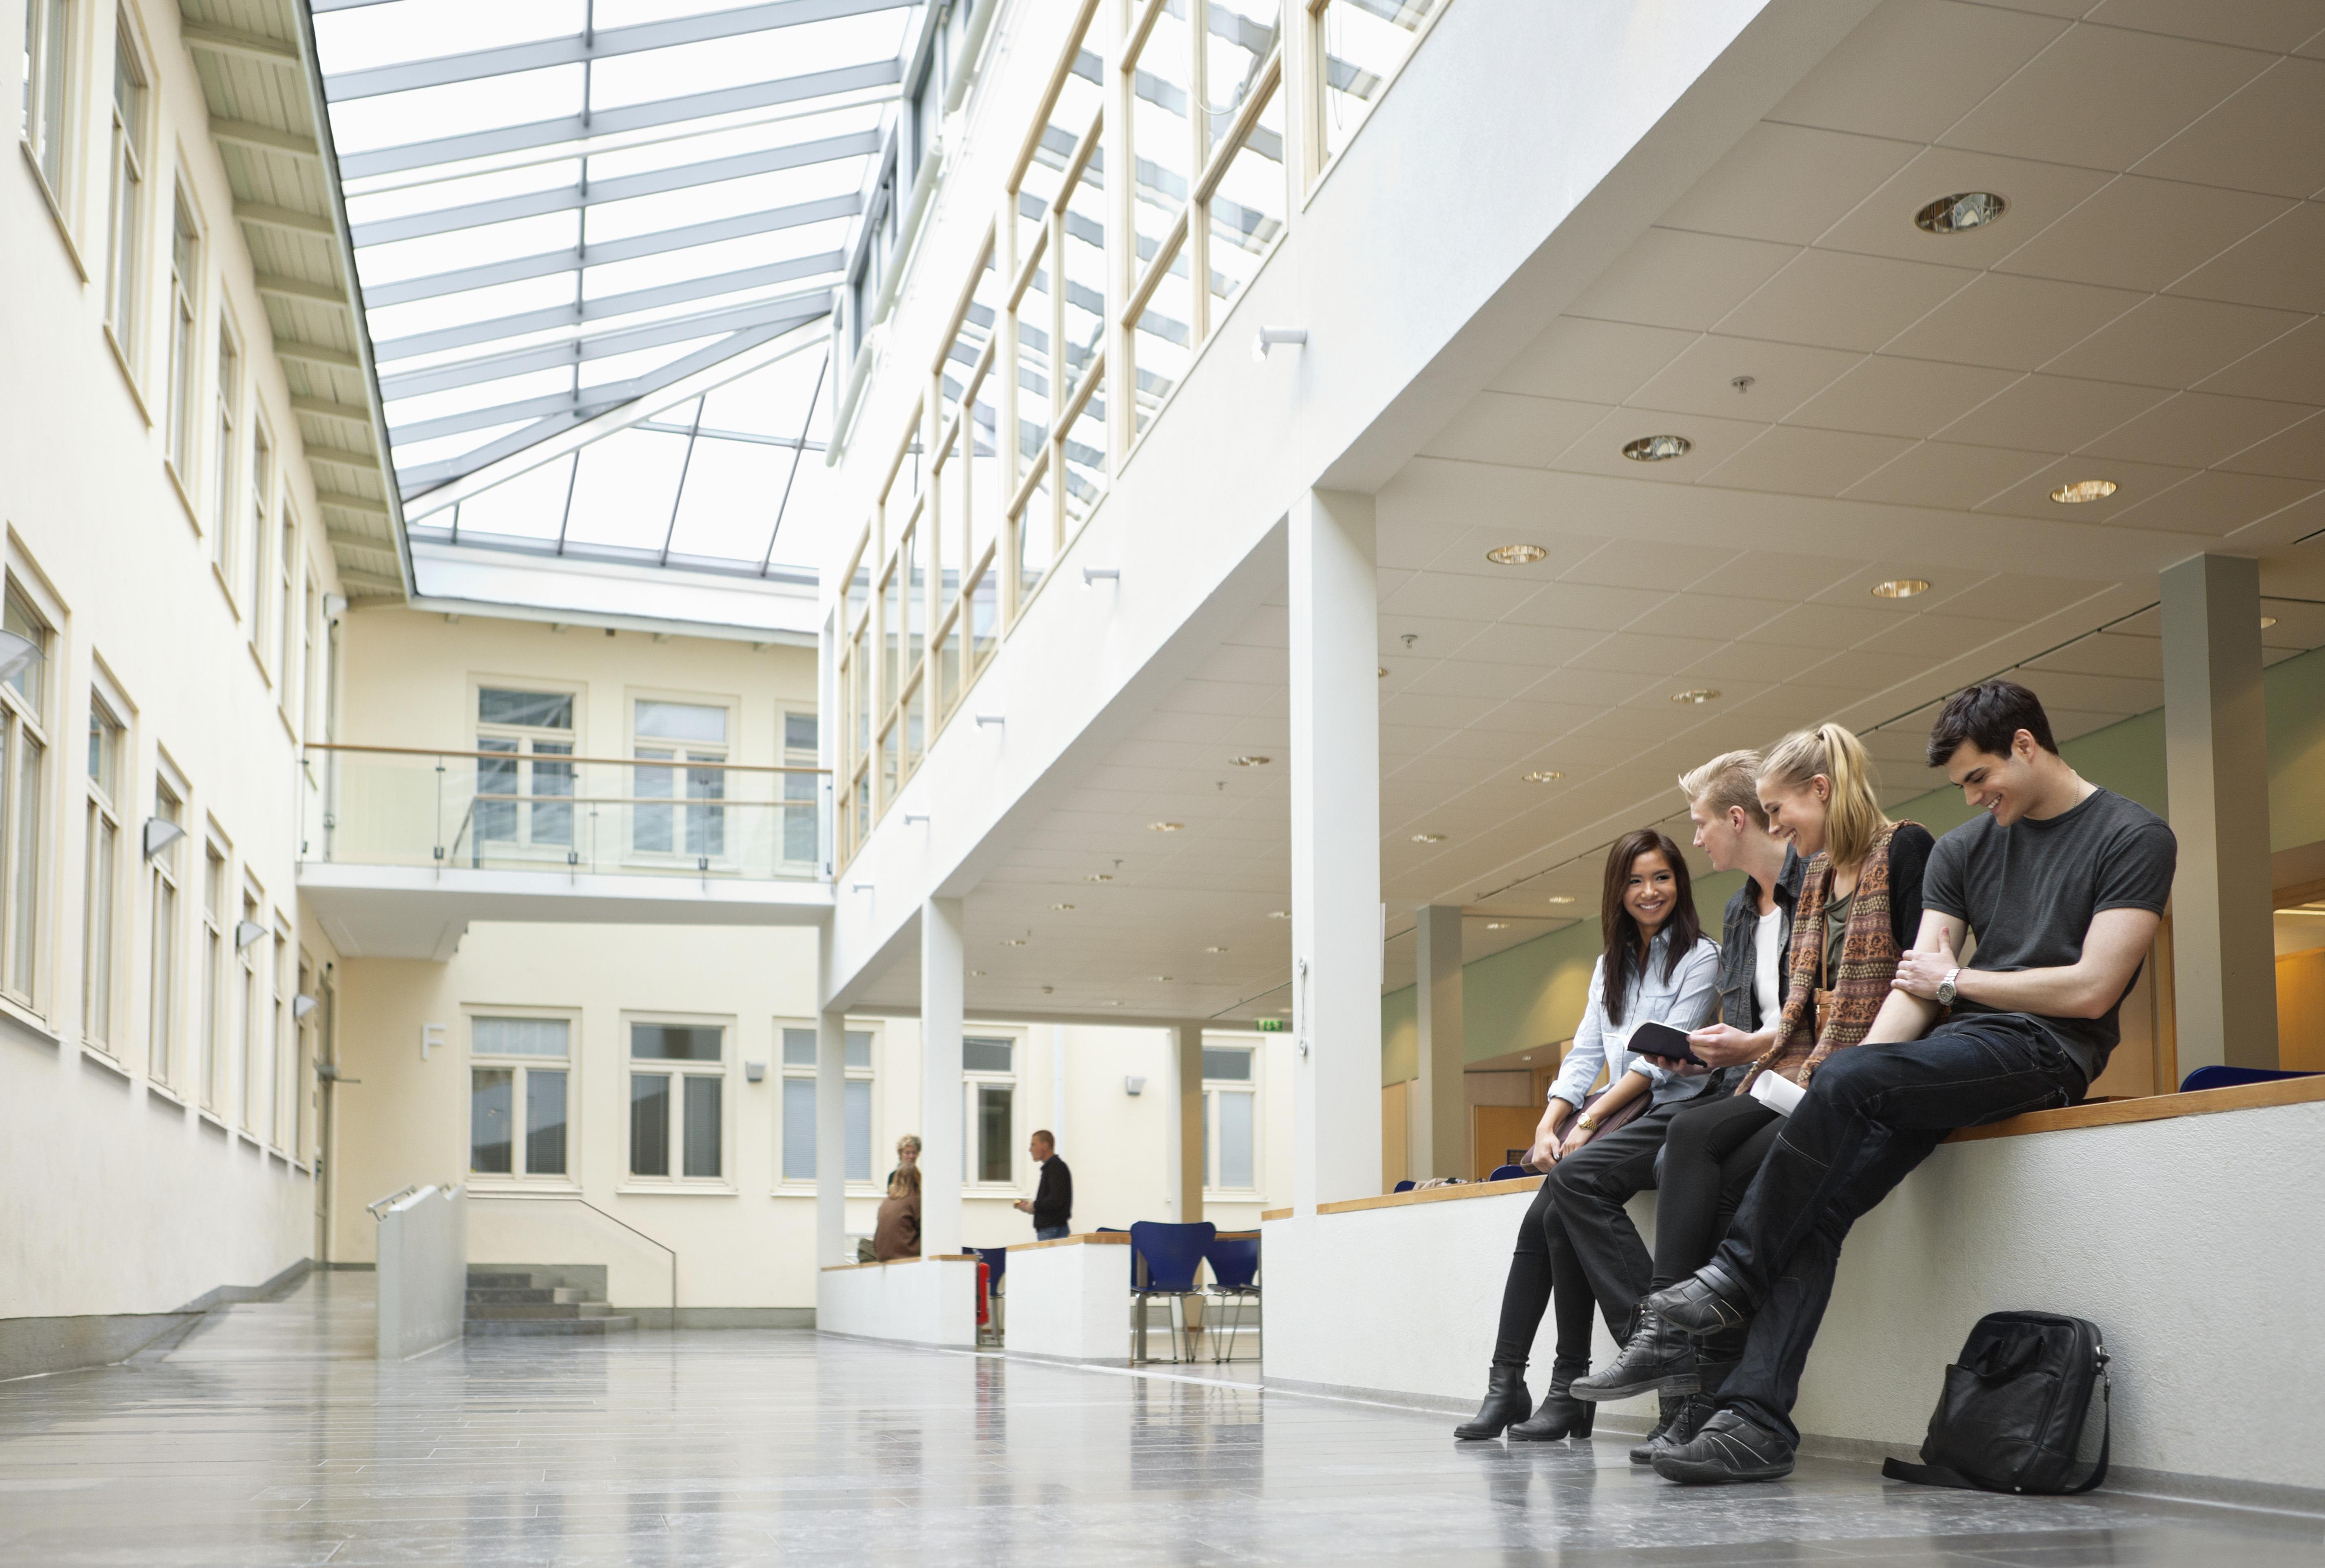 Studenter som sitter i en gang på skolen